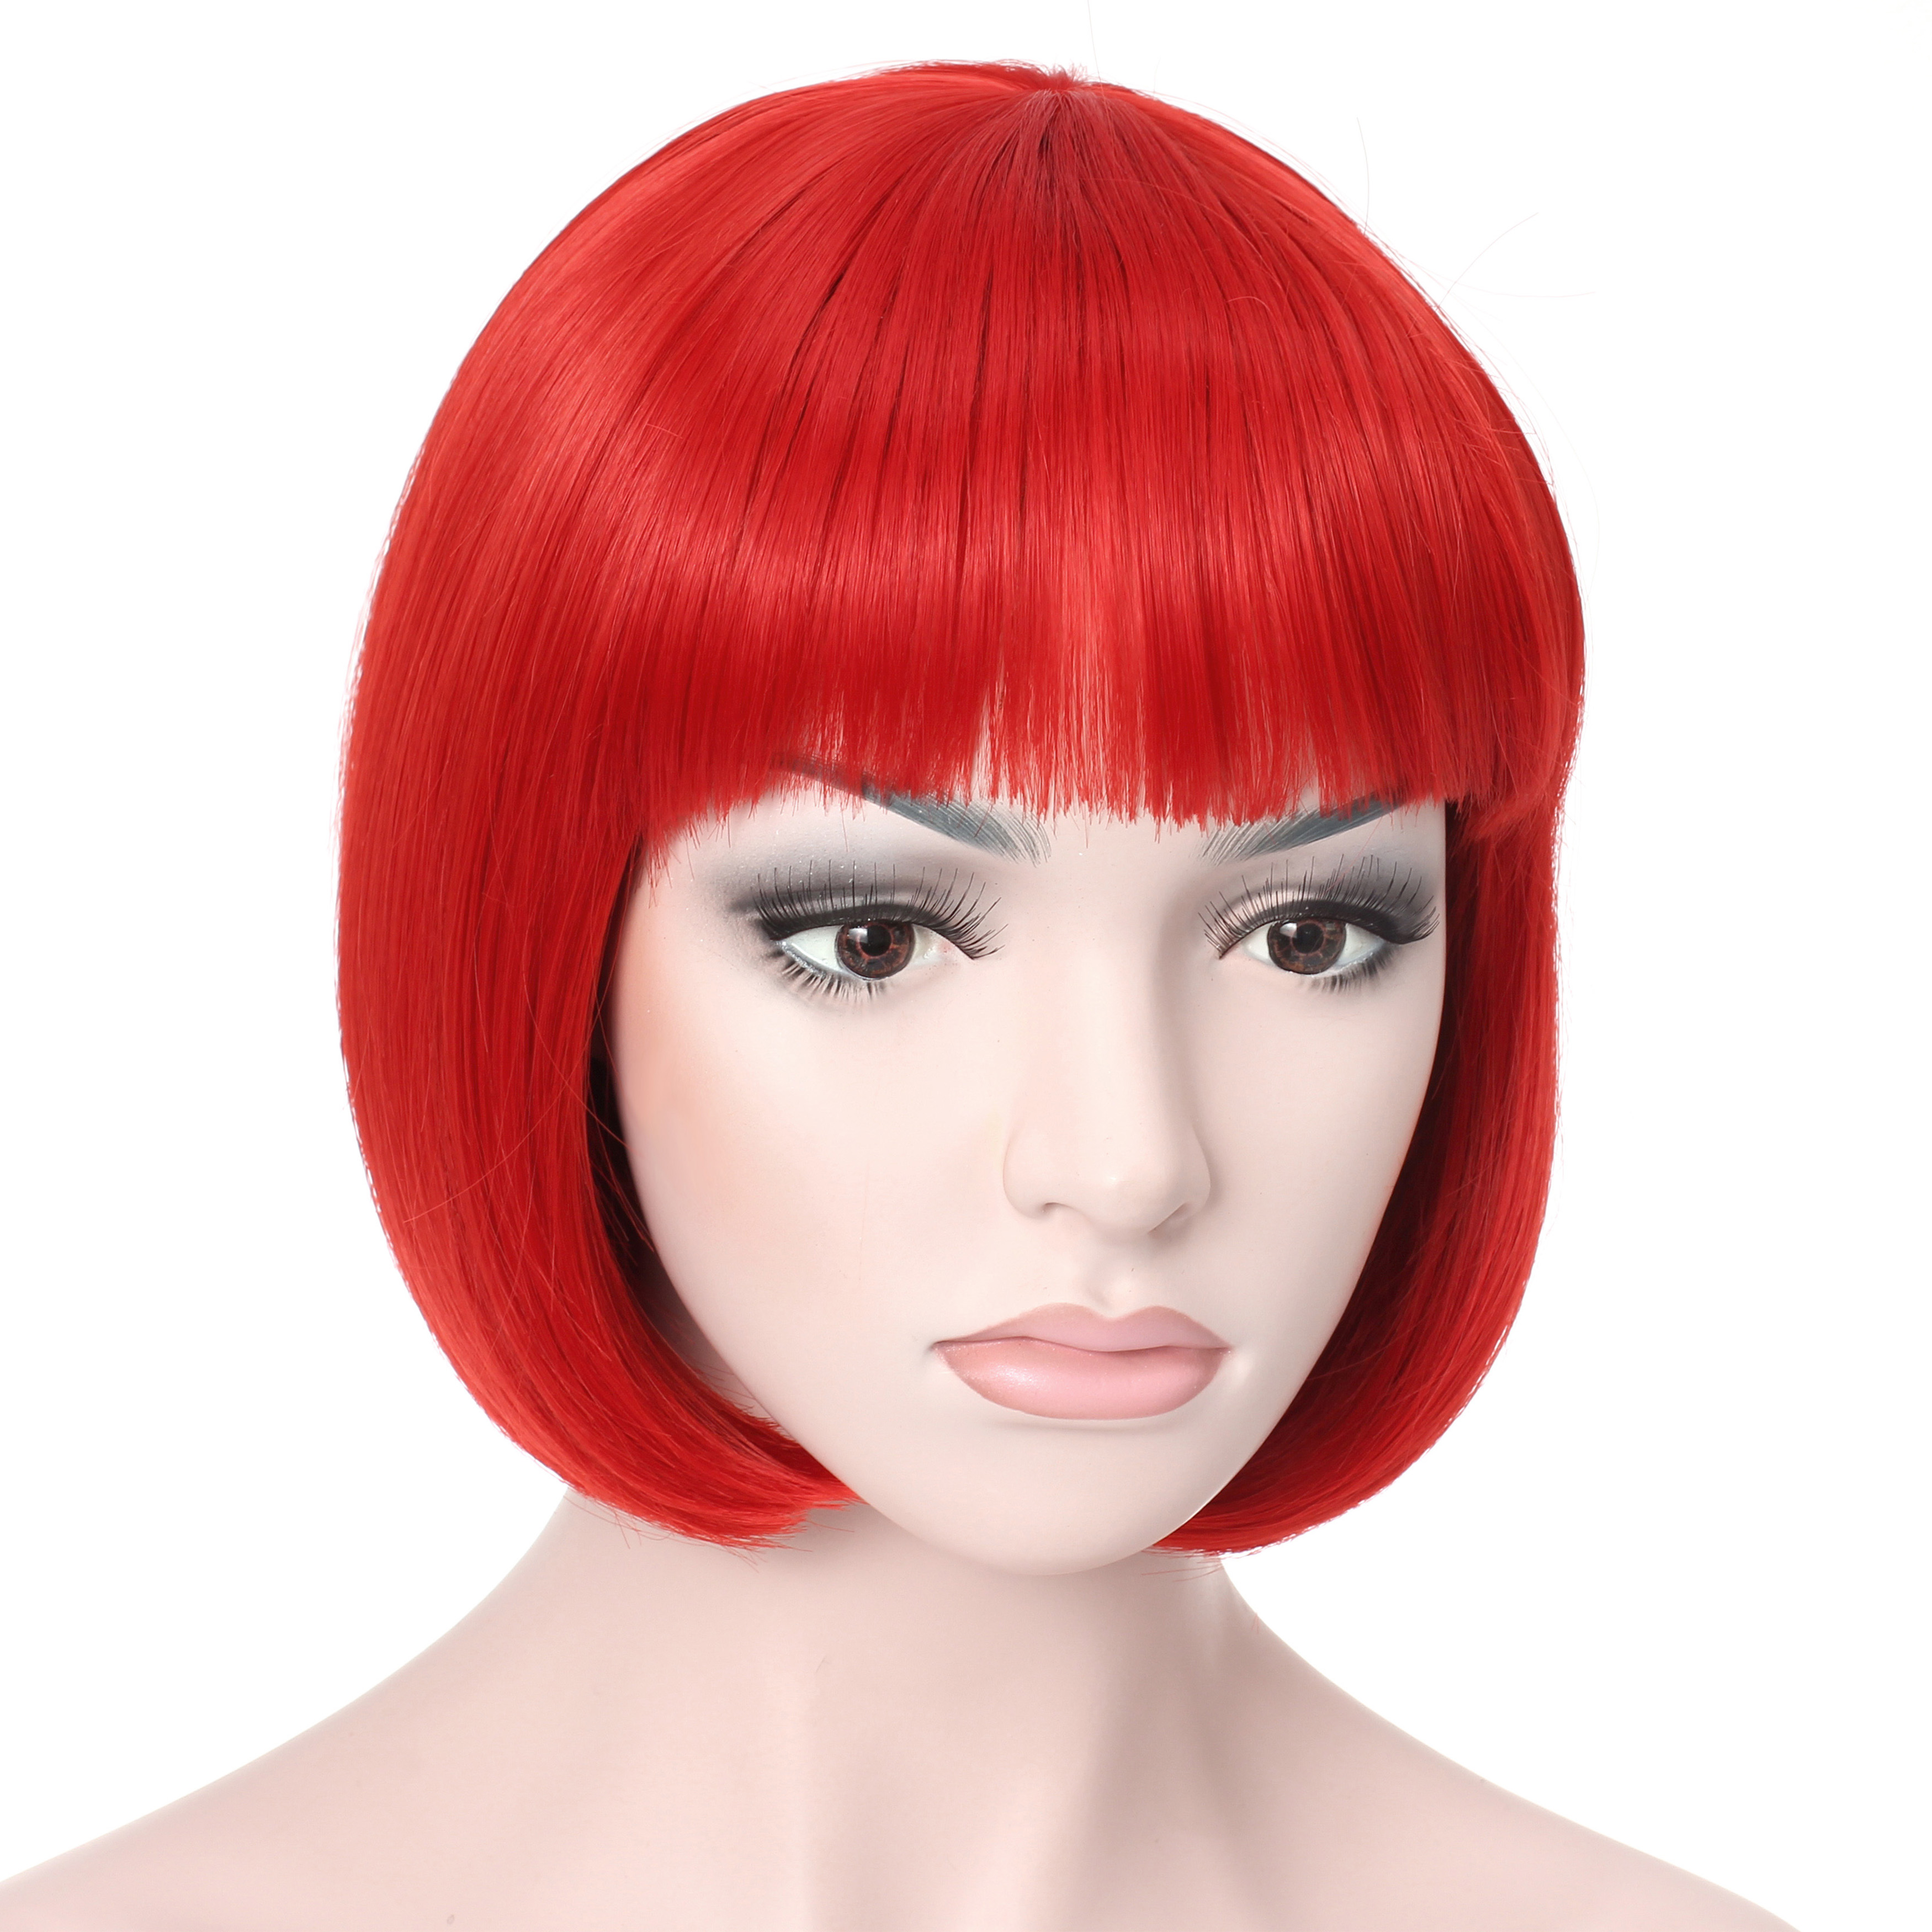 "OneDor® 10"" Short Straight Flapper Bob Cosplay Hair Wig"